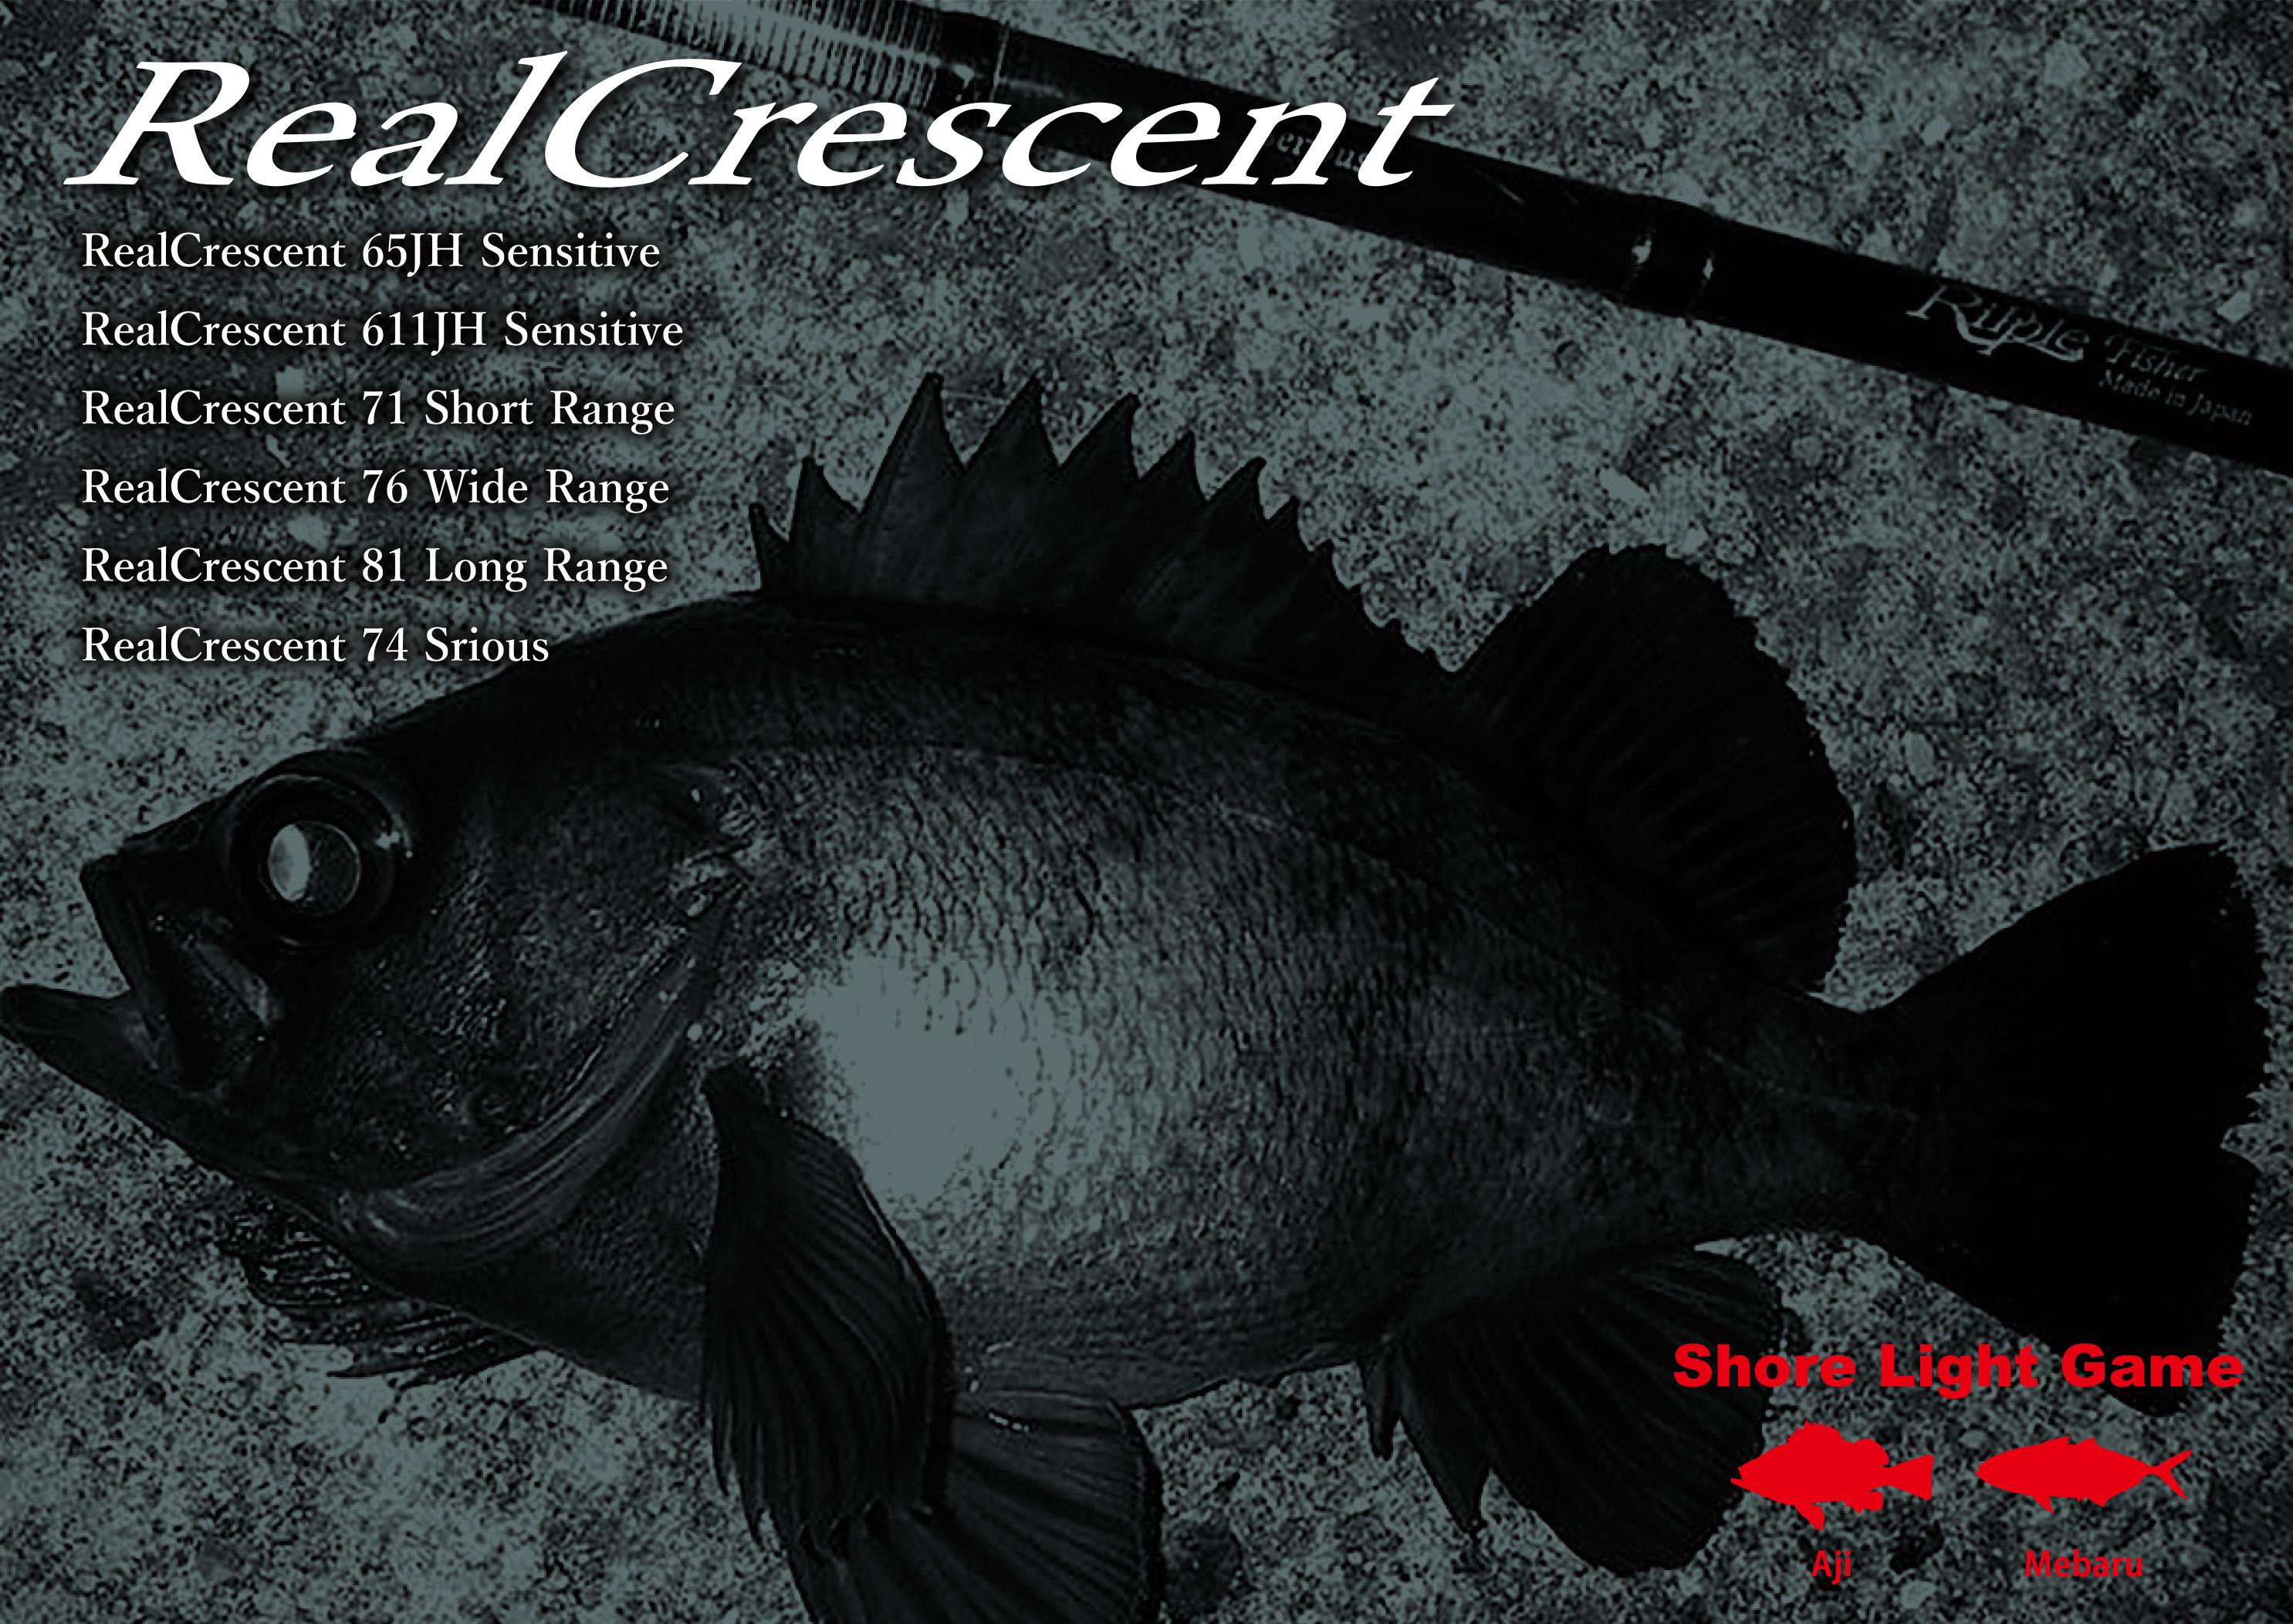 RealCrescent / Light Game